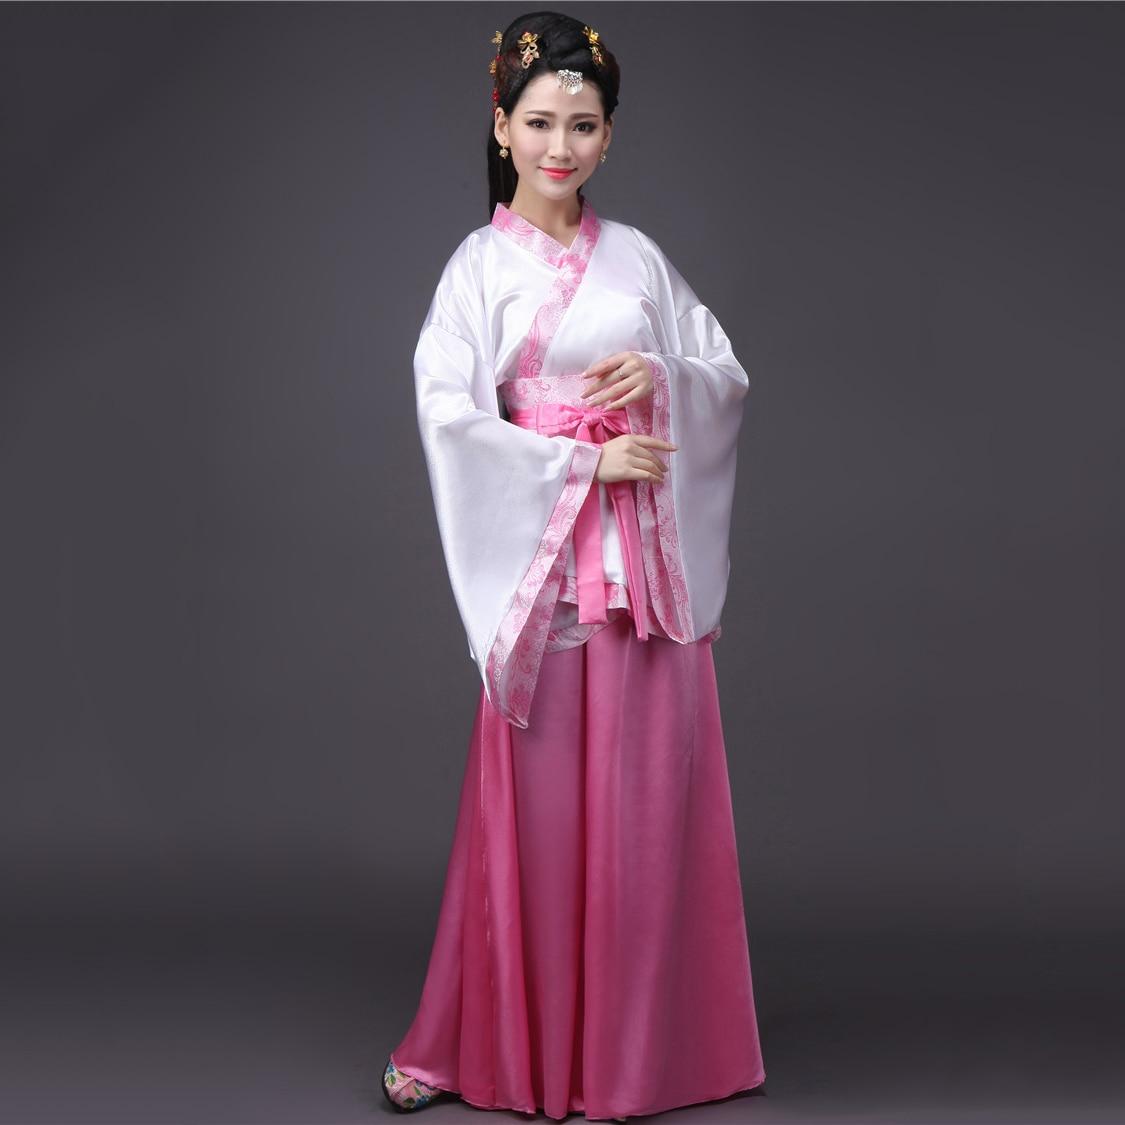 Women's Dress For Oriental Dancing Hanfu Female Traditional Chinese Clothing Purple Blue Red Pink White Hanfu Dance Dress